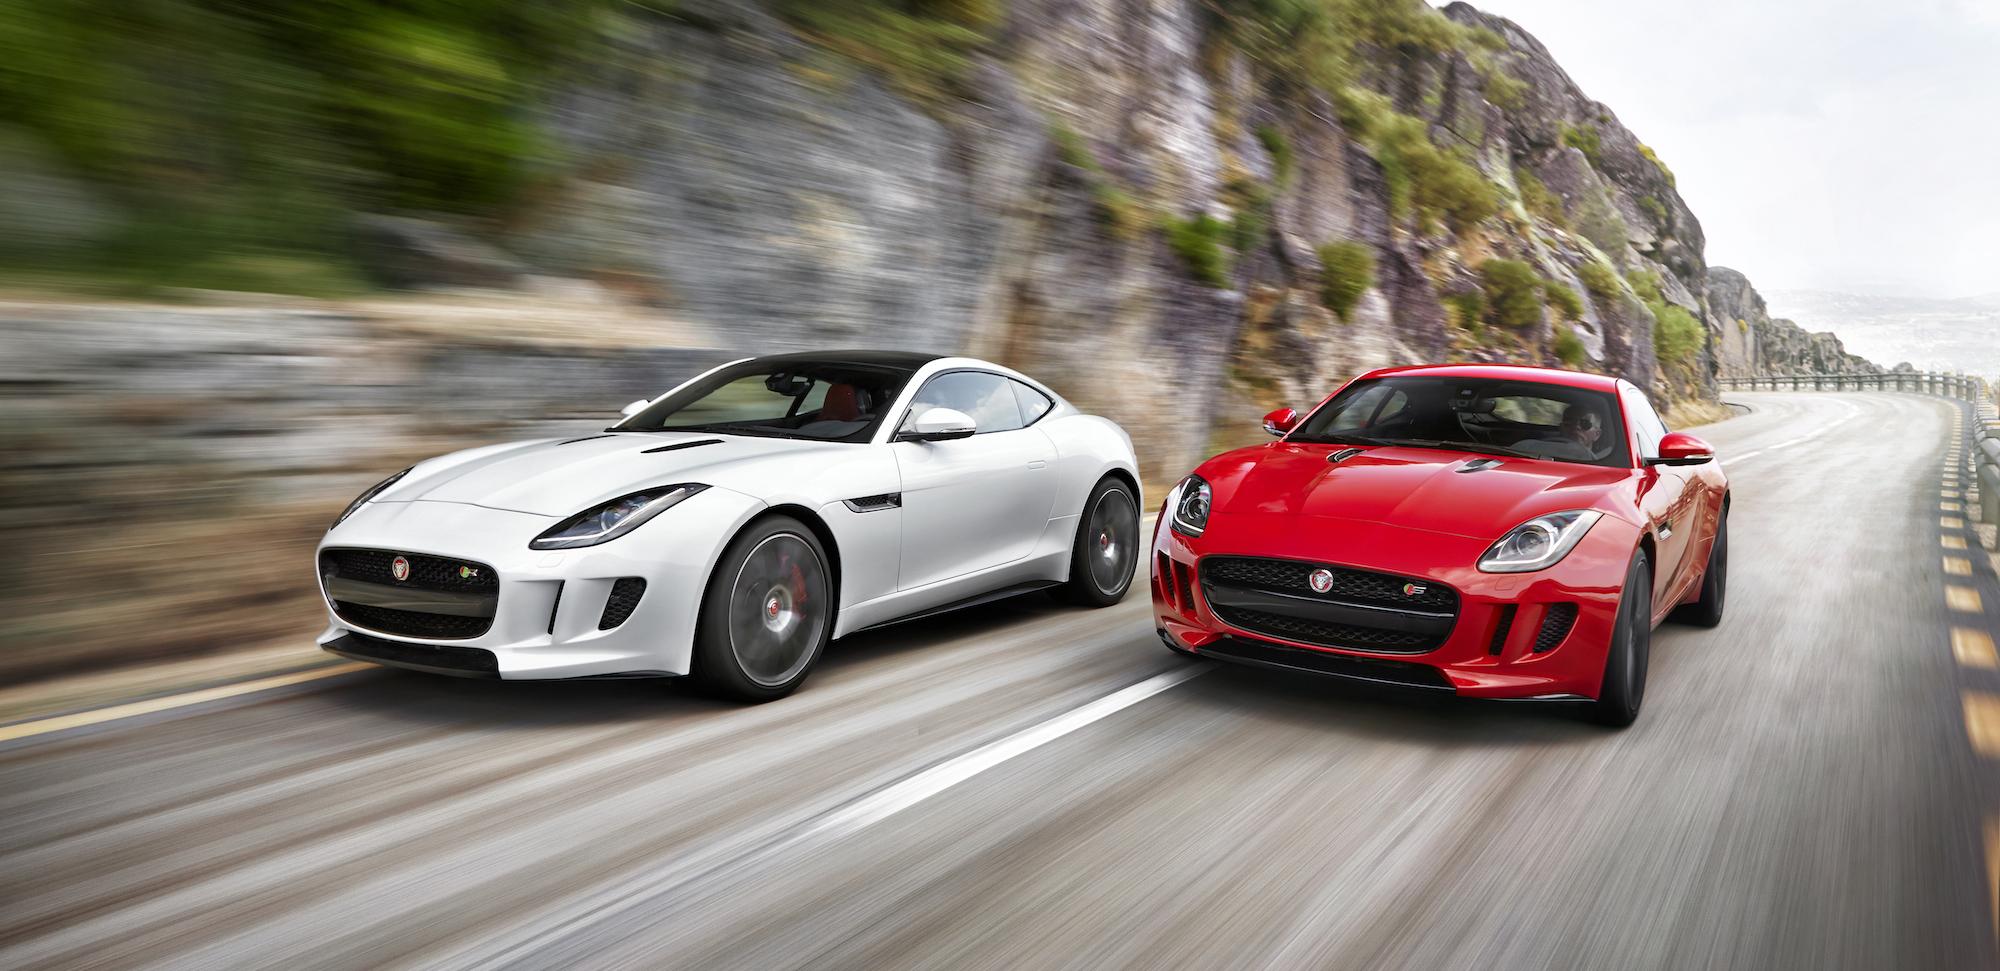 Porsche macan jaguar f type coupe 2015 mustang debut date car news headlines